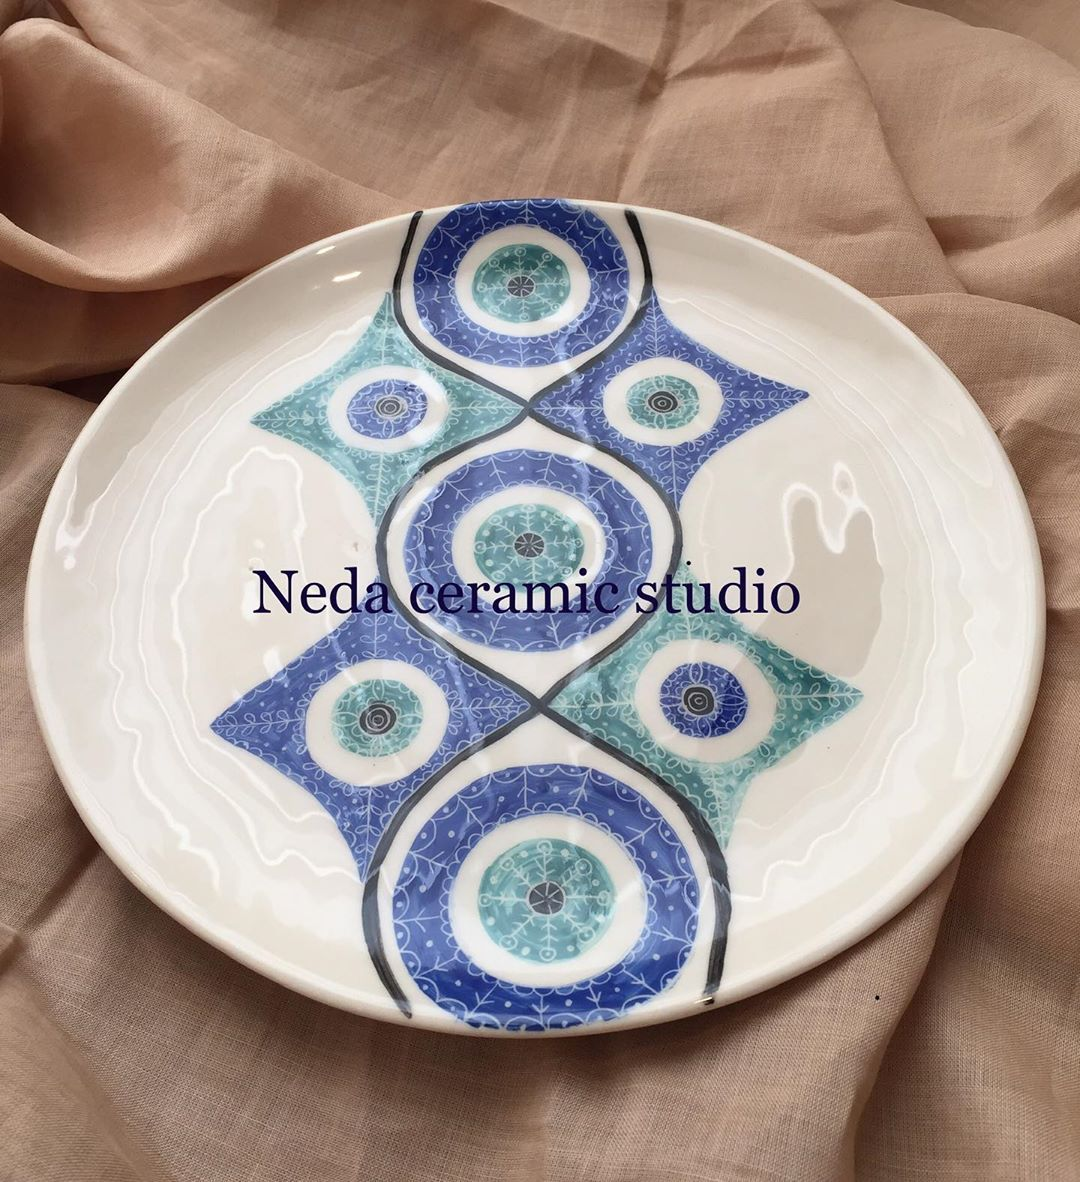 "🌀NedaBayat🌀 on Instagram: ""#ceramics #ceramiccoating #cramic #ceramicart #ceramicsofinstagram #ceramicsculpture #ceramicas #ceramicartist #ceramica #underglaze…"""